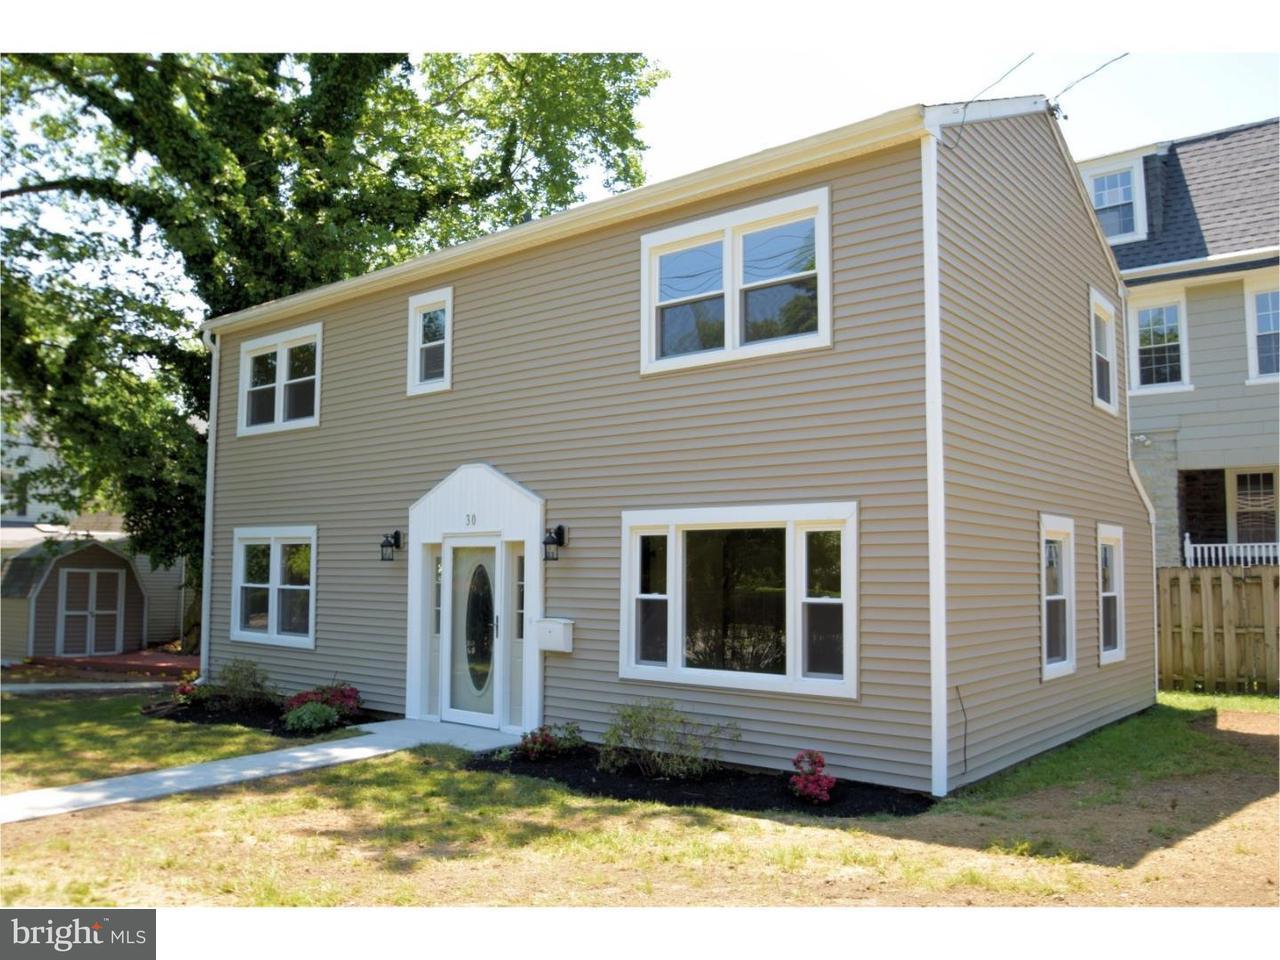 Single Family Home for Rent at 30 BRYN MAWR Avenue Bala Cynwyd, Pennsylvania 19004 United States